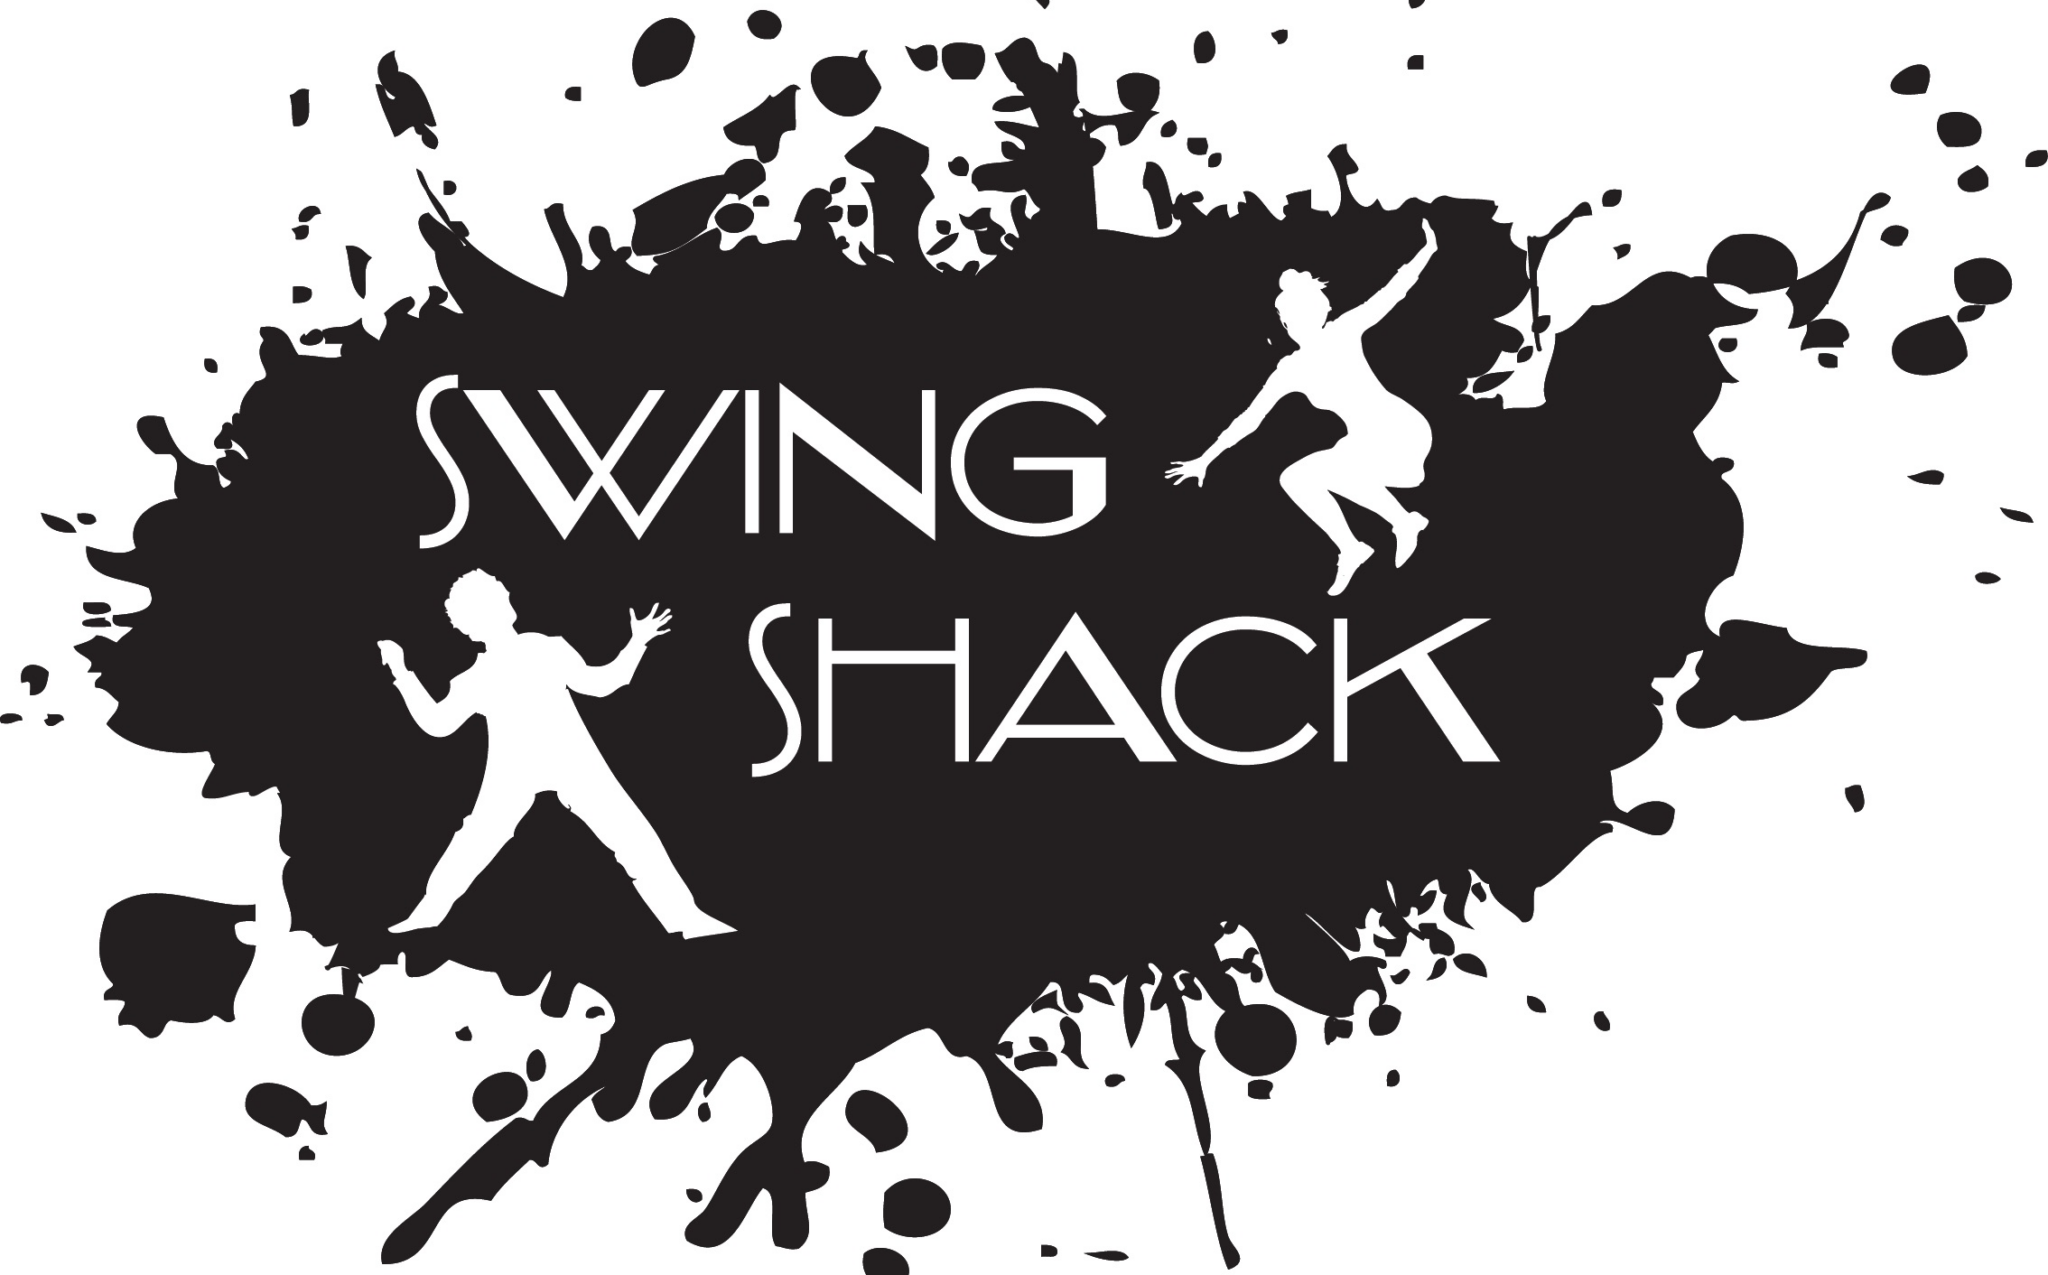 Swingshack